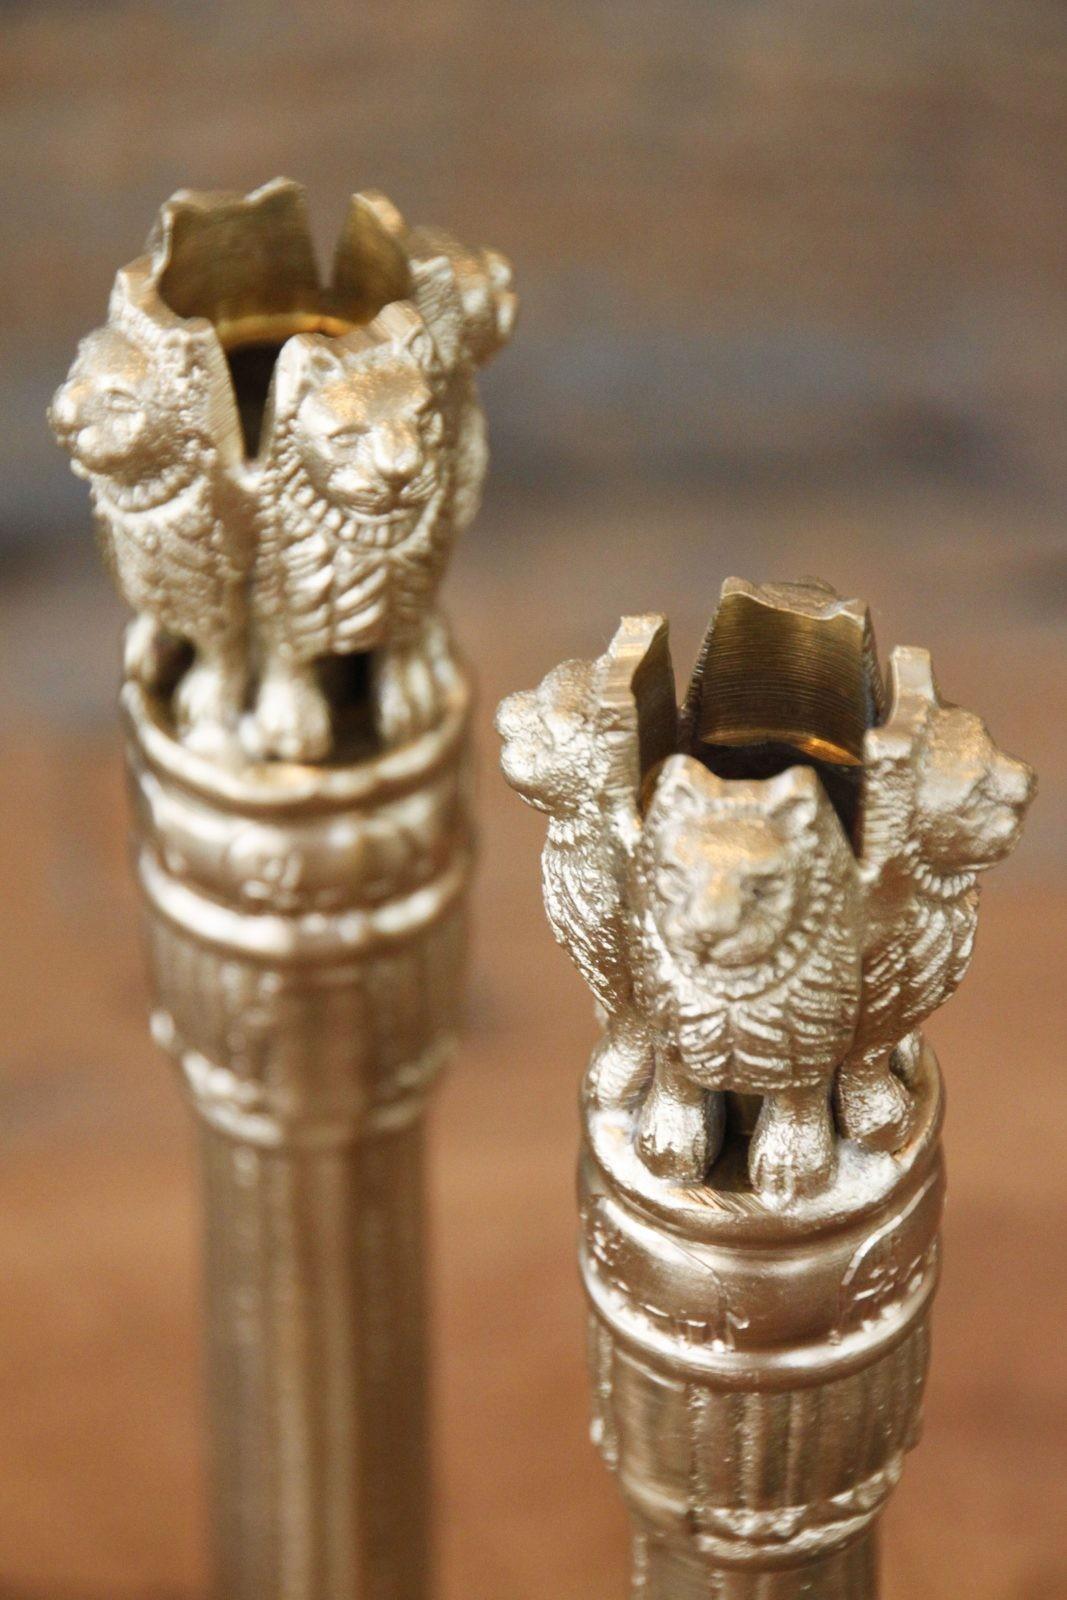 DOING  GOODS-Lion Candle Holder, set of 3